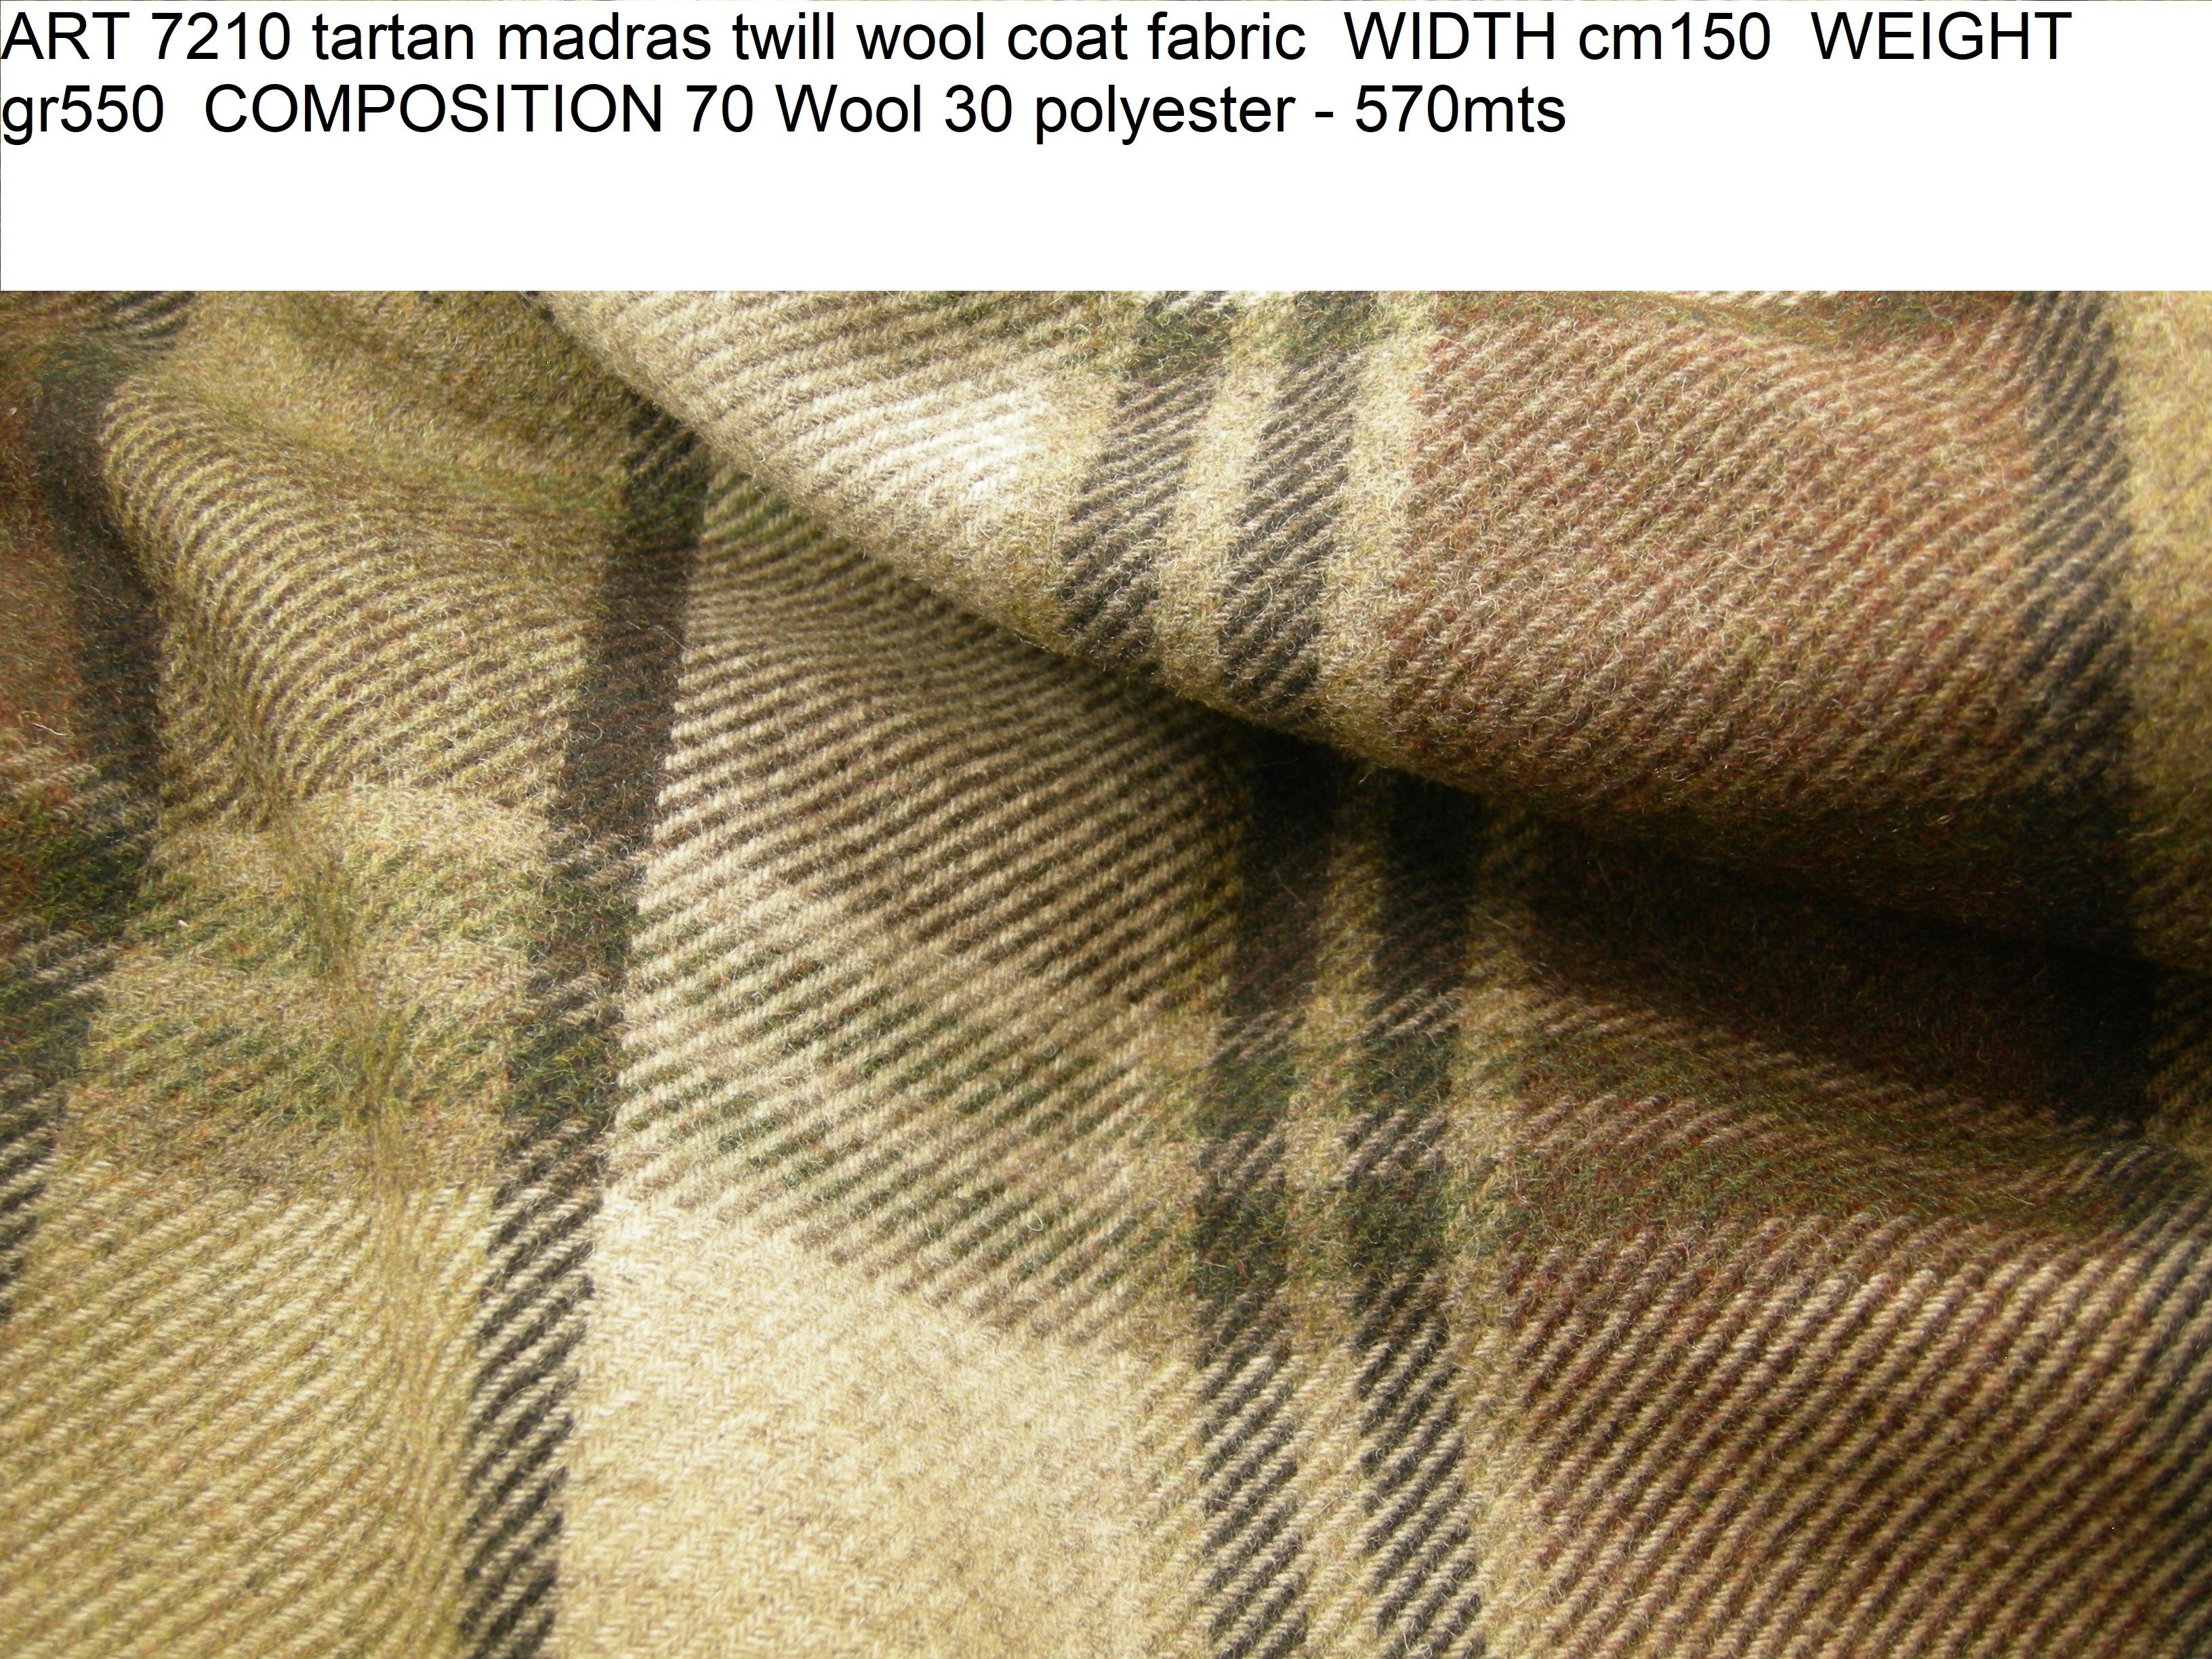 ART 7210 tartan madras twill wool coat fabric WIDTH cm150 WEIGHT gr550 COMPOSITION 70 Wool 30 polyester – 570mts